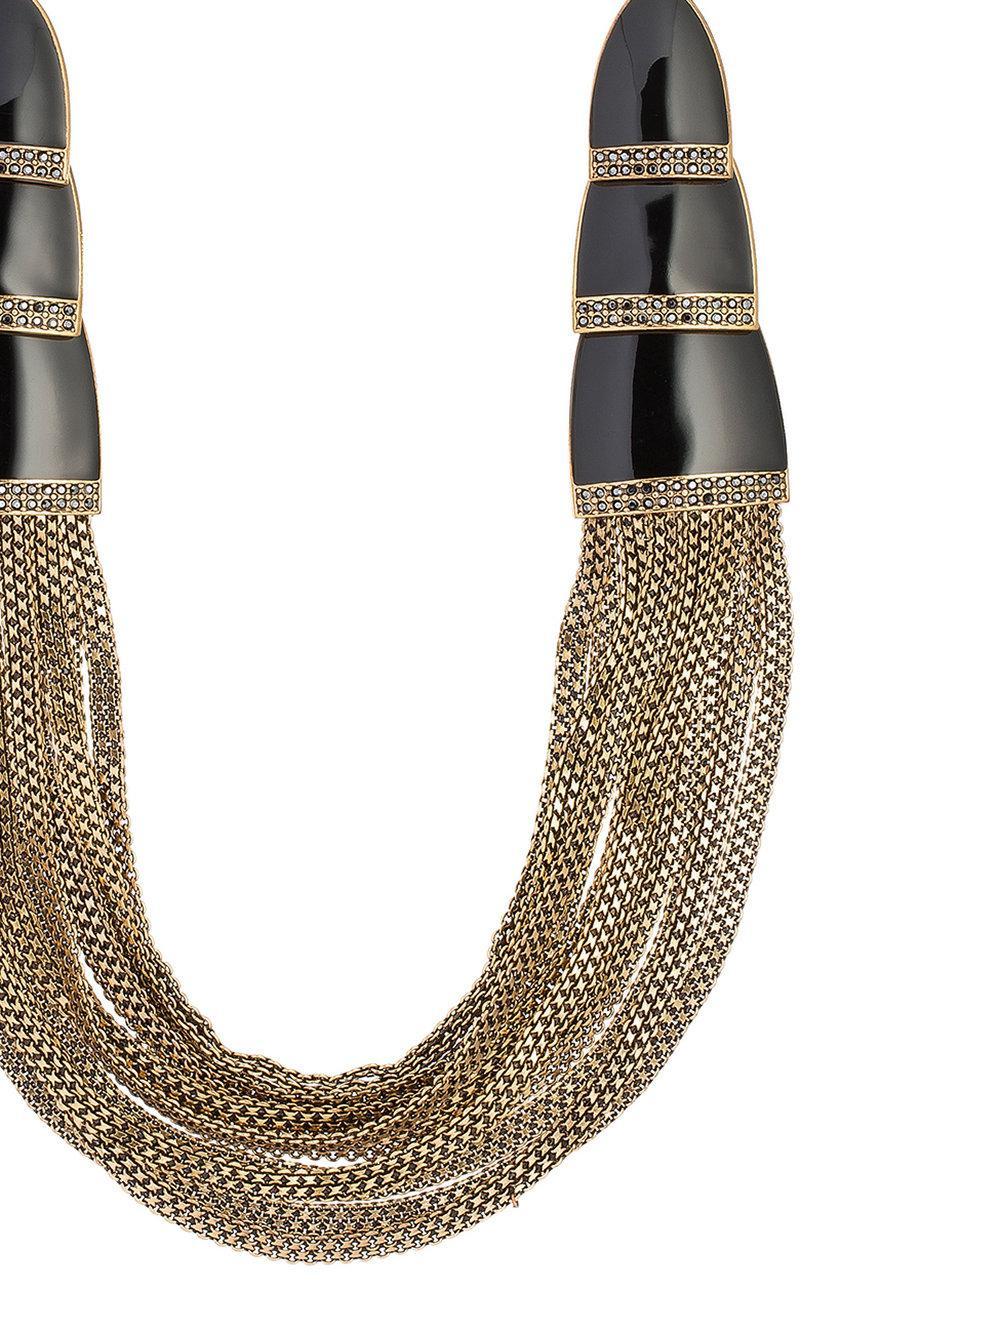 Camila Klein Correntária long necklace - Metallic vrZZiiSUr3